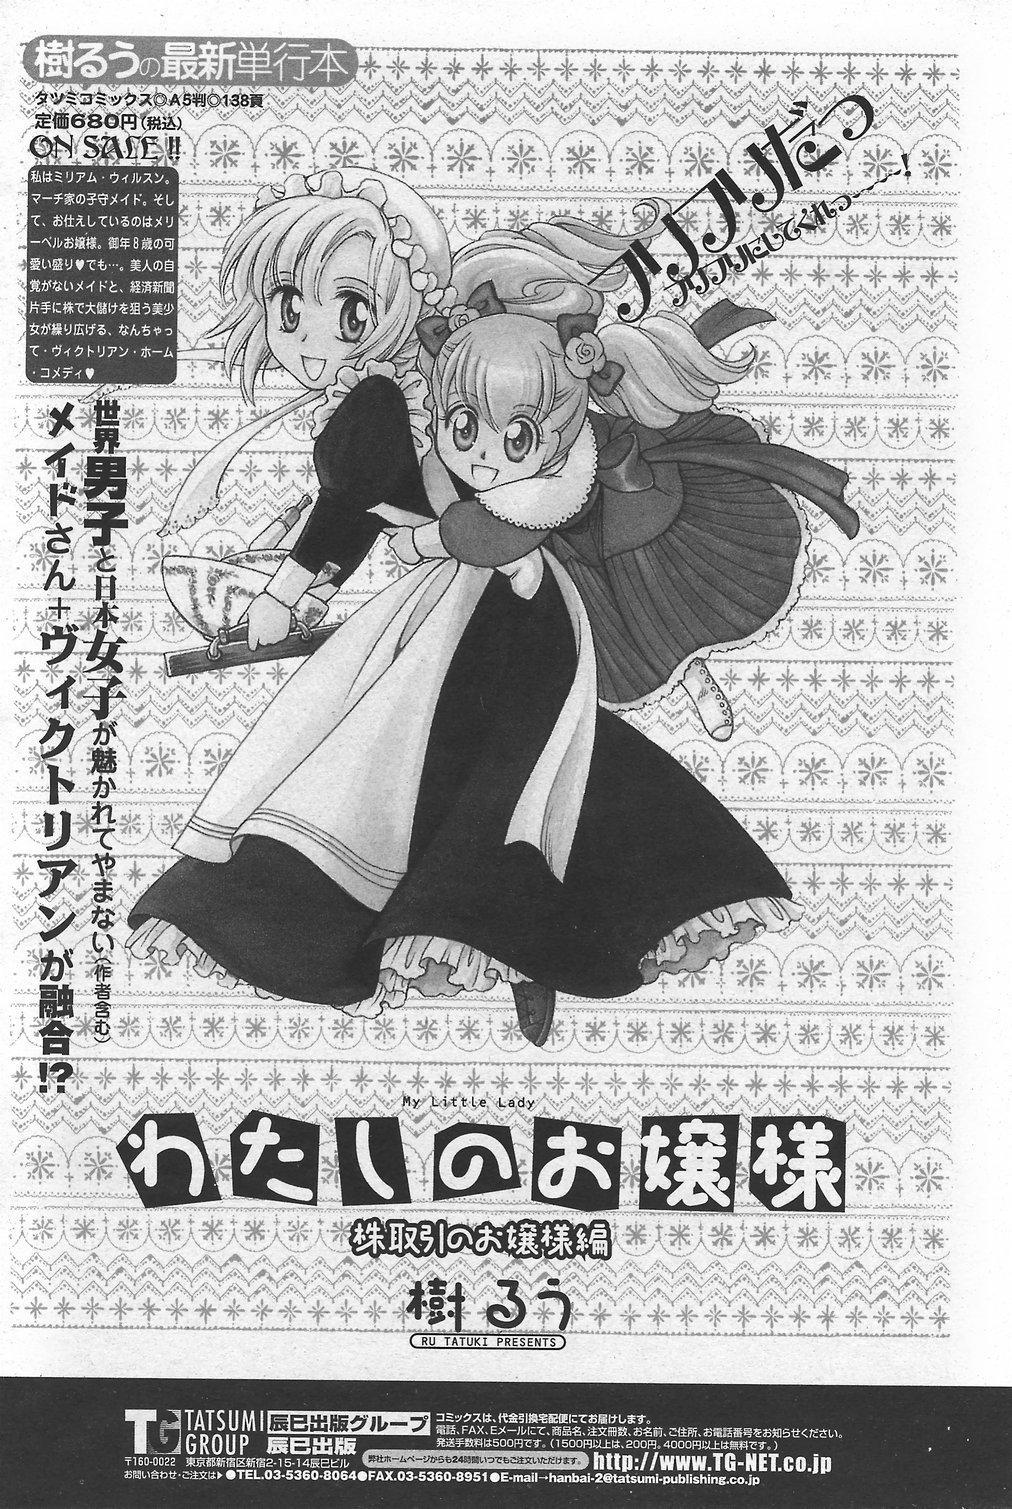 COMIC Penguin Club Sanzokuban 2007-10 Vol. 225 238